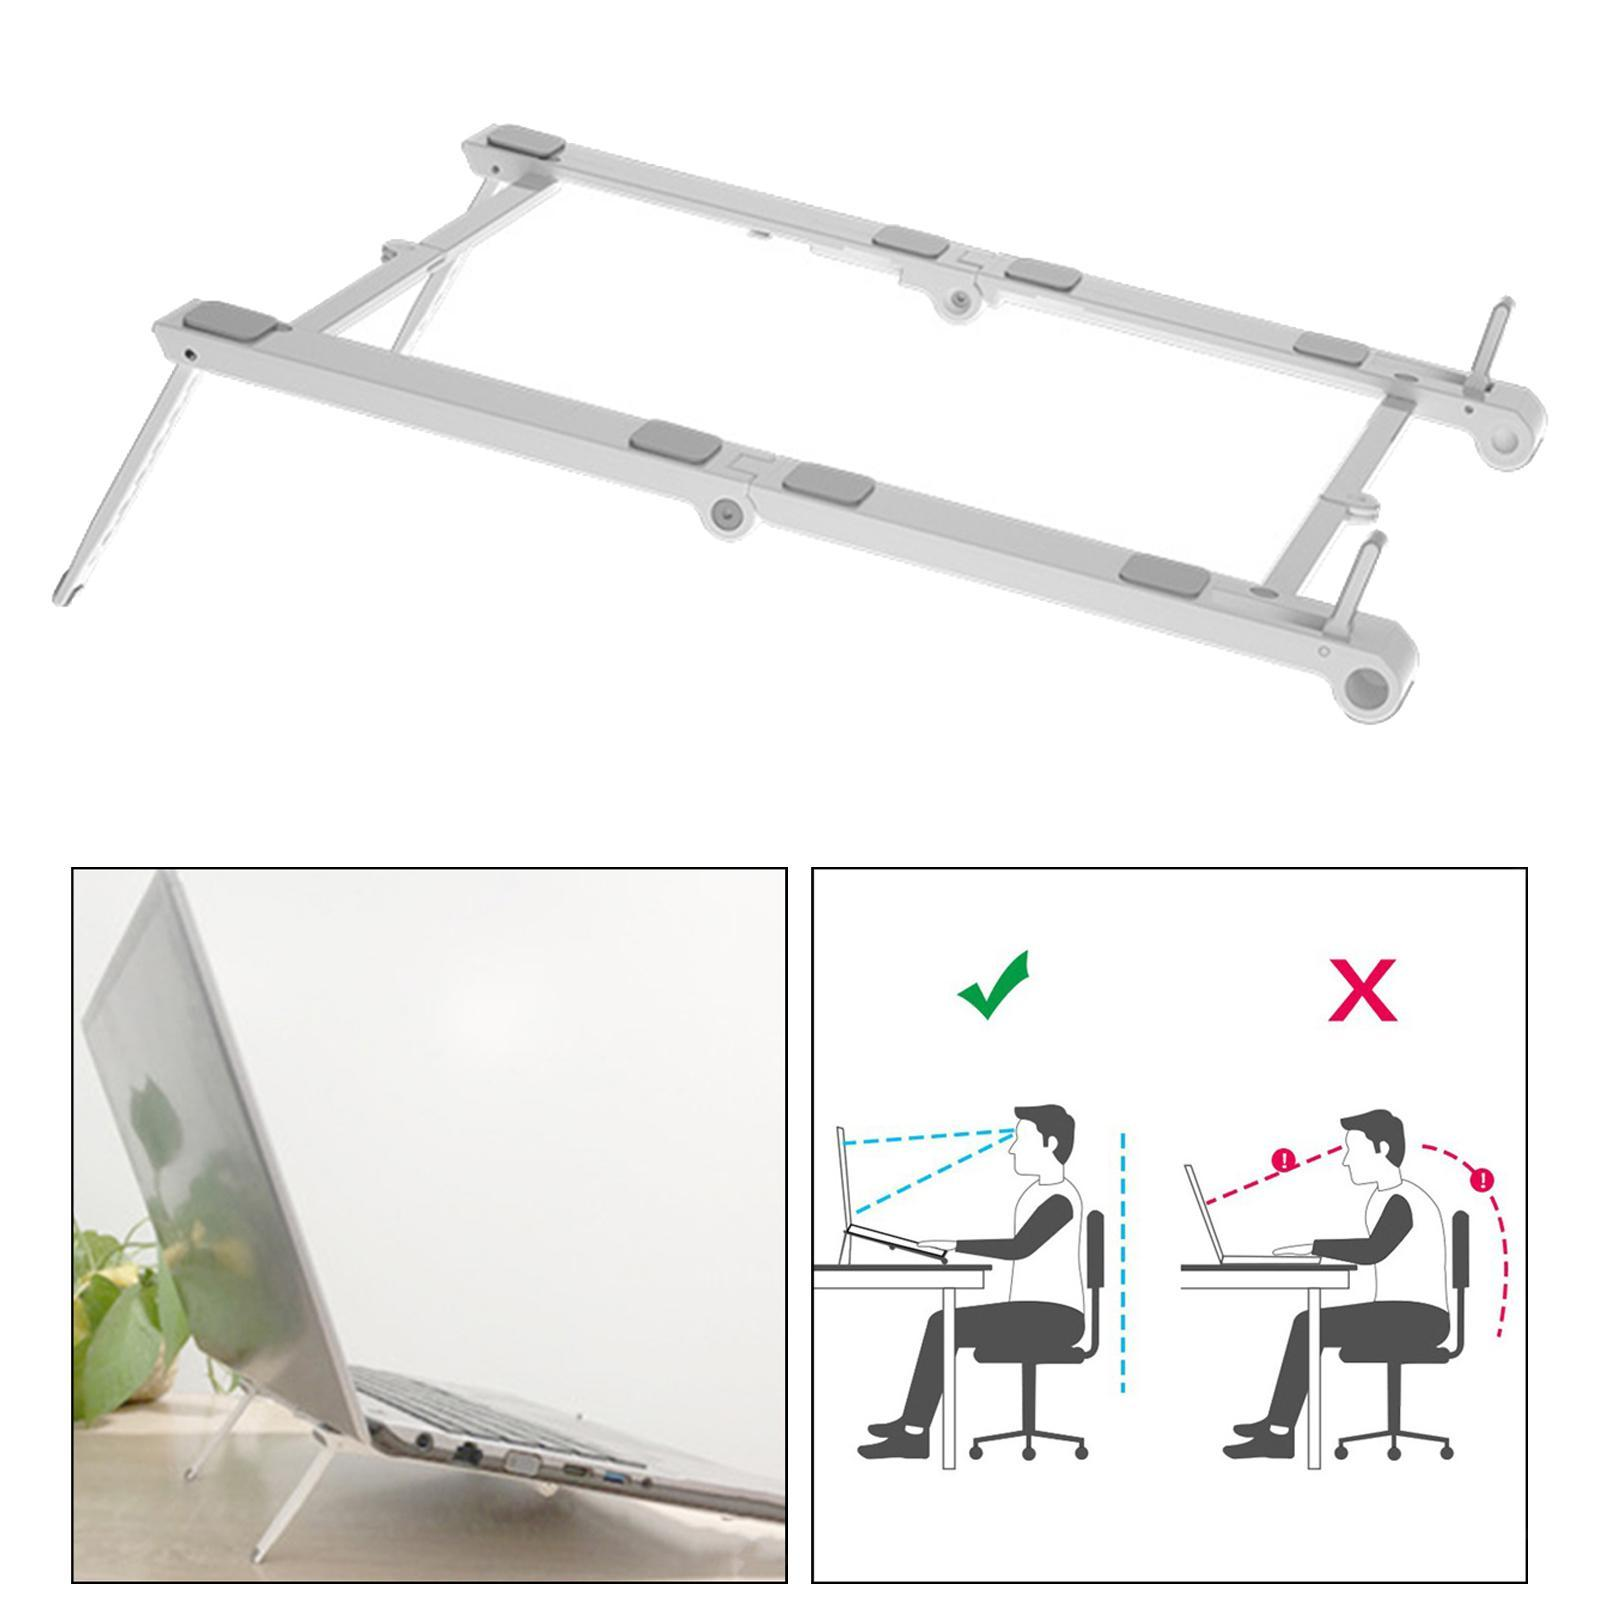 thumbnail 5 - 3 in1 Adjustable Laptop Stand Ergonomic Folding Hollow Radiating for Bracket